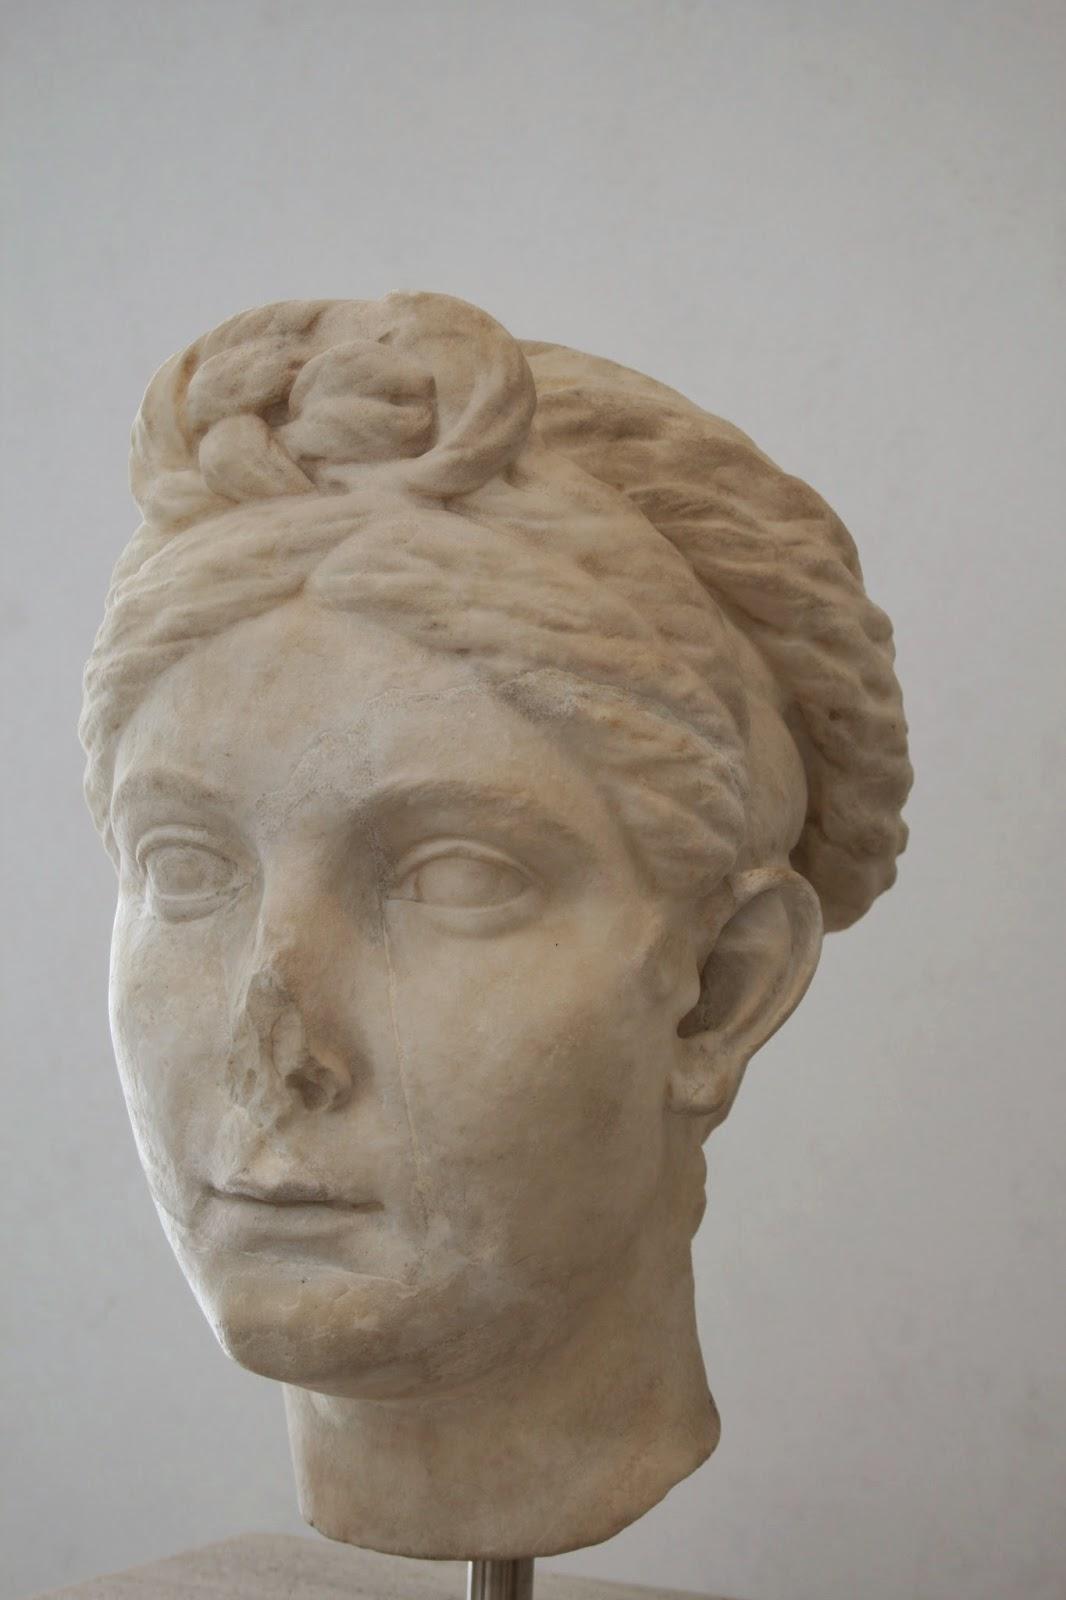 Peinados Estilo Romano Fotos - peinados romanos facilisimo